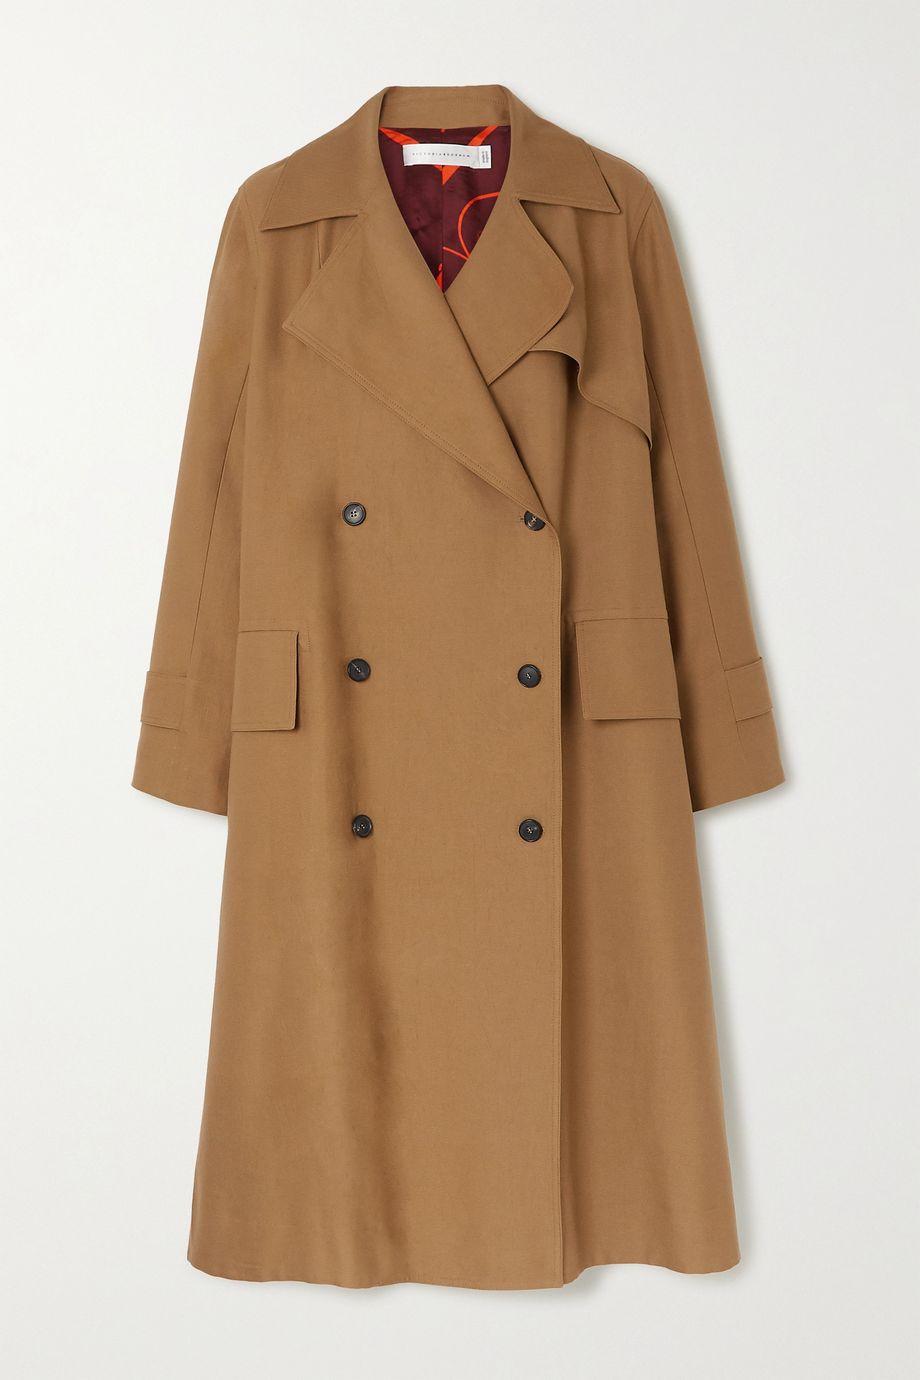 Victoria Beckham Cotton-blend canvas trench coat